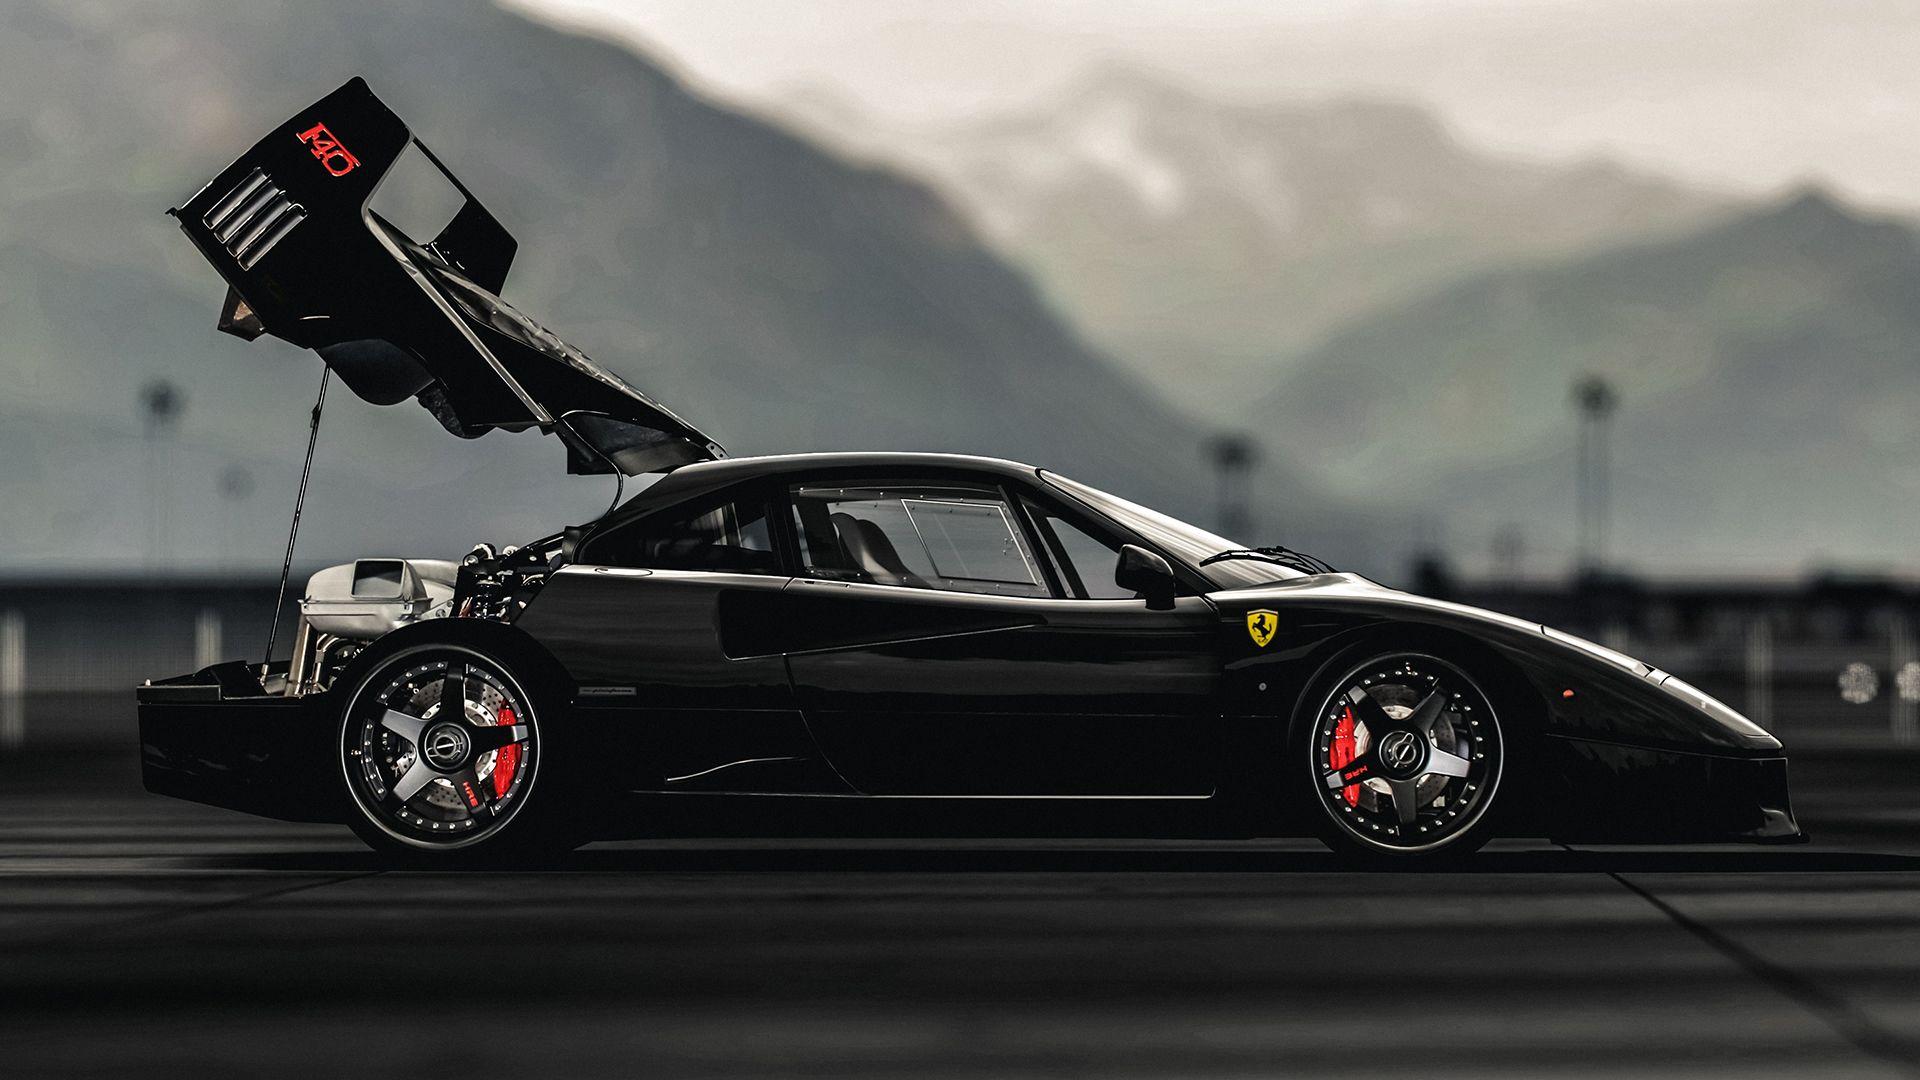 Black Ferrari F40 Wallpaper Ferrari f40 black wallpaper